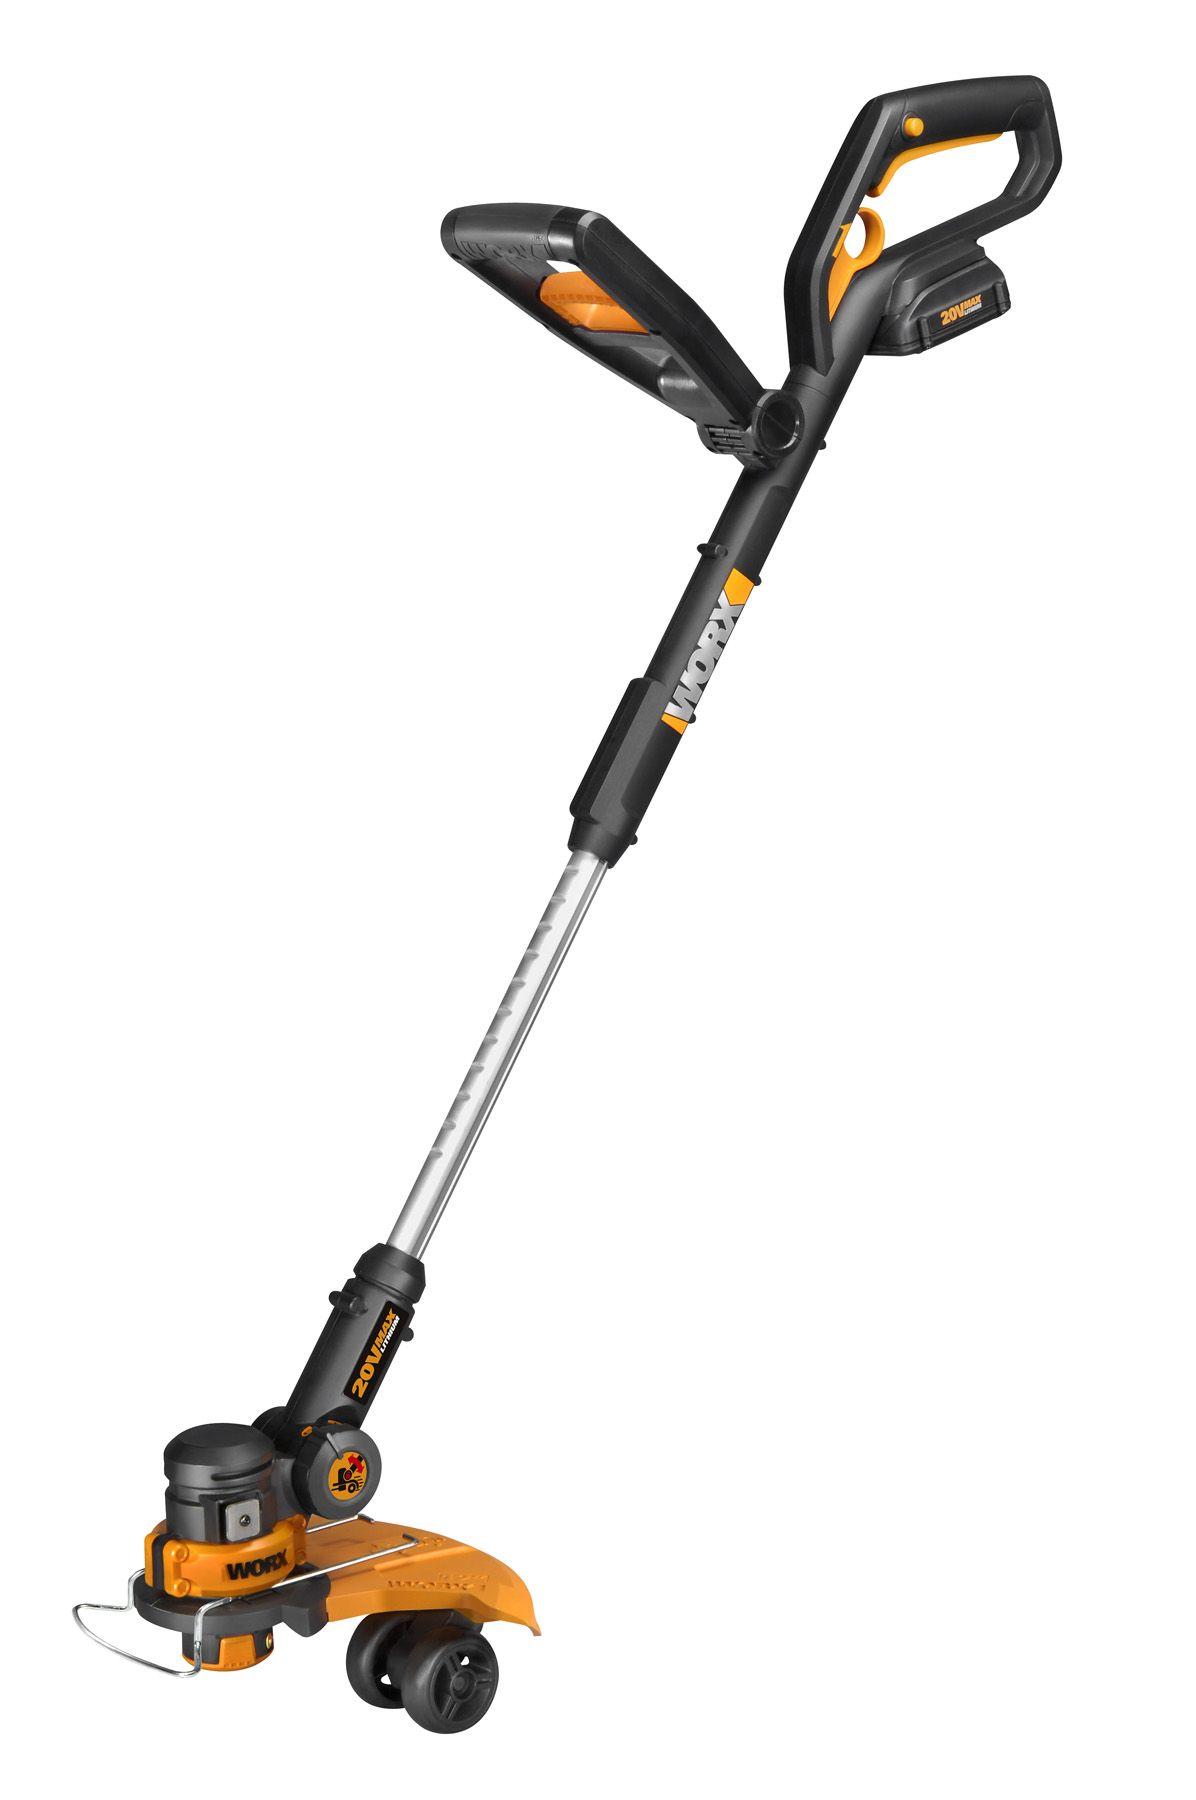 Worx 20 Volt 2 0 Gt Trimmer Edger Mini Mower Giveaway Cordless